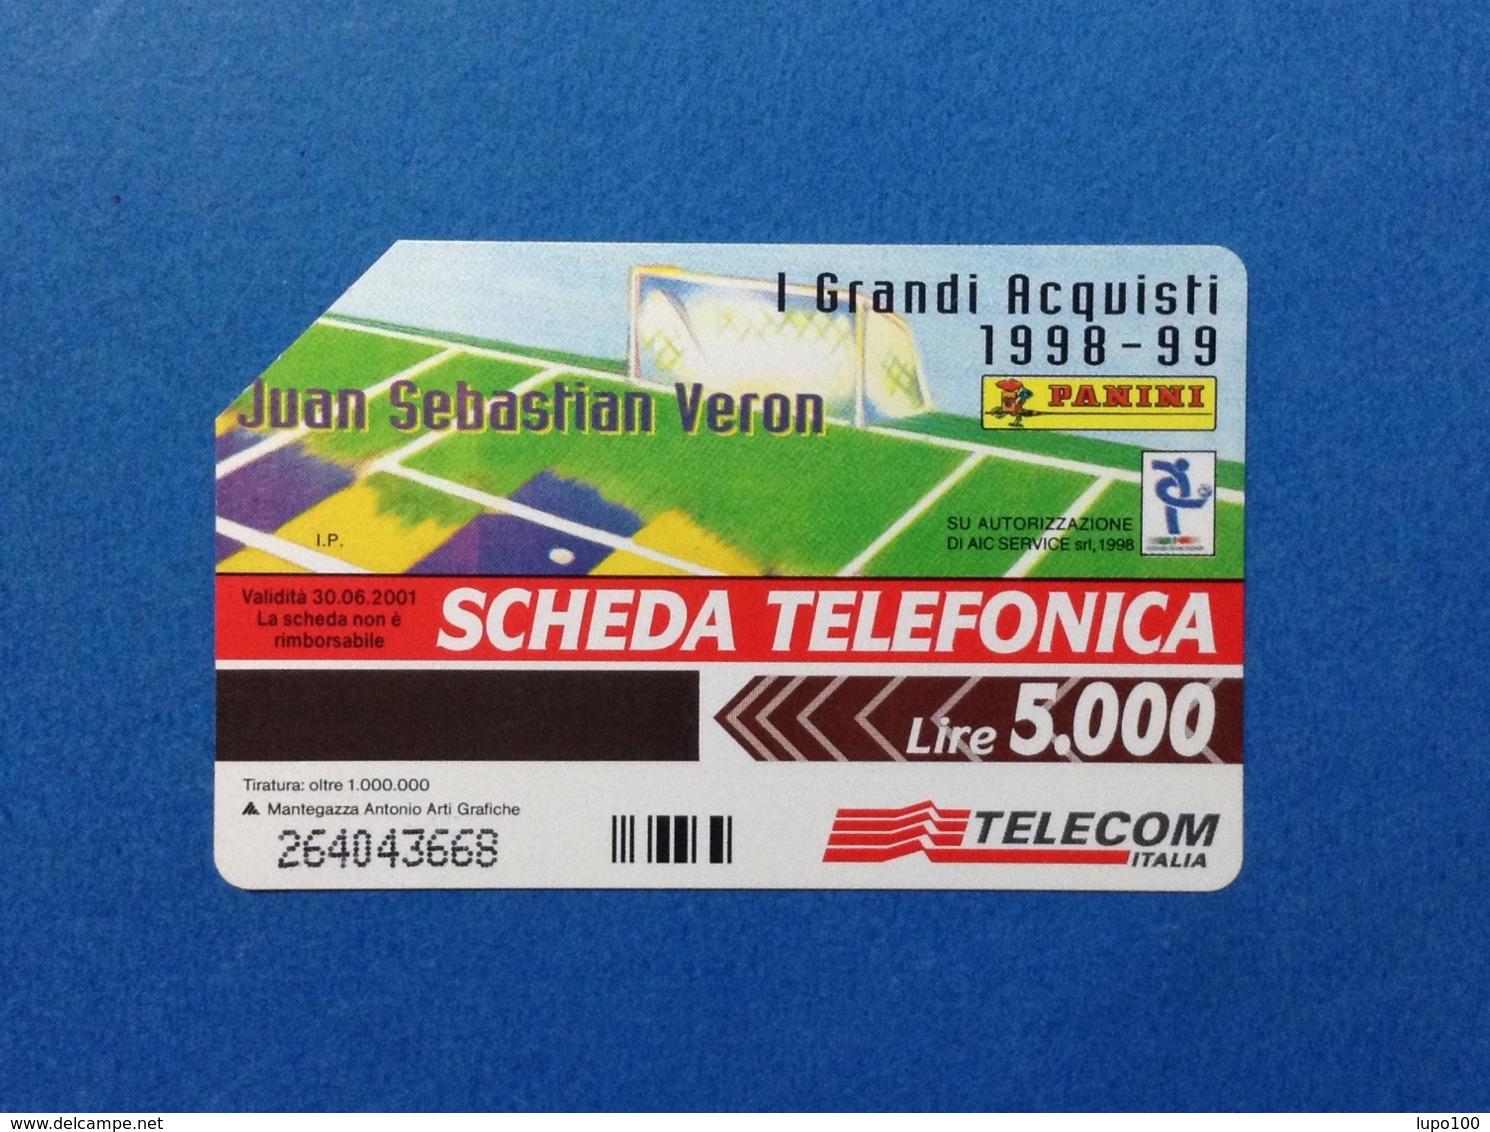 ITALIA SCHEDA TELEFONICA TELECOM USATA PHONE CARD USED I GRANDI ACQUISTI 1998 99 PANINI JUAN SEBASTIAN VERON - Italia